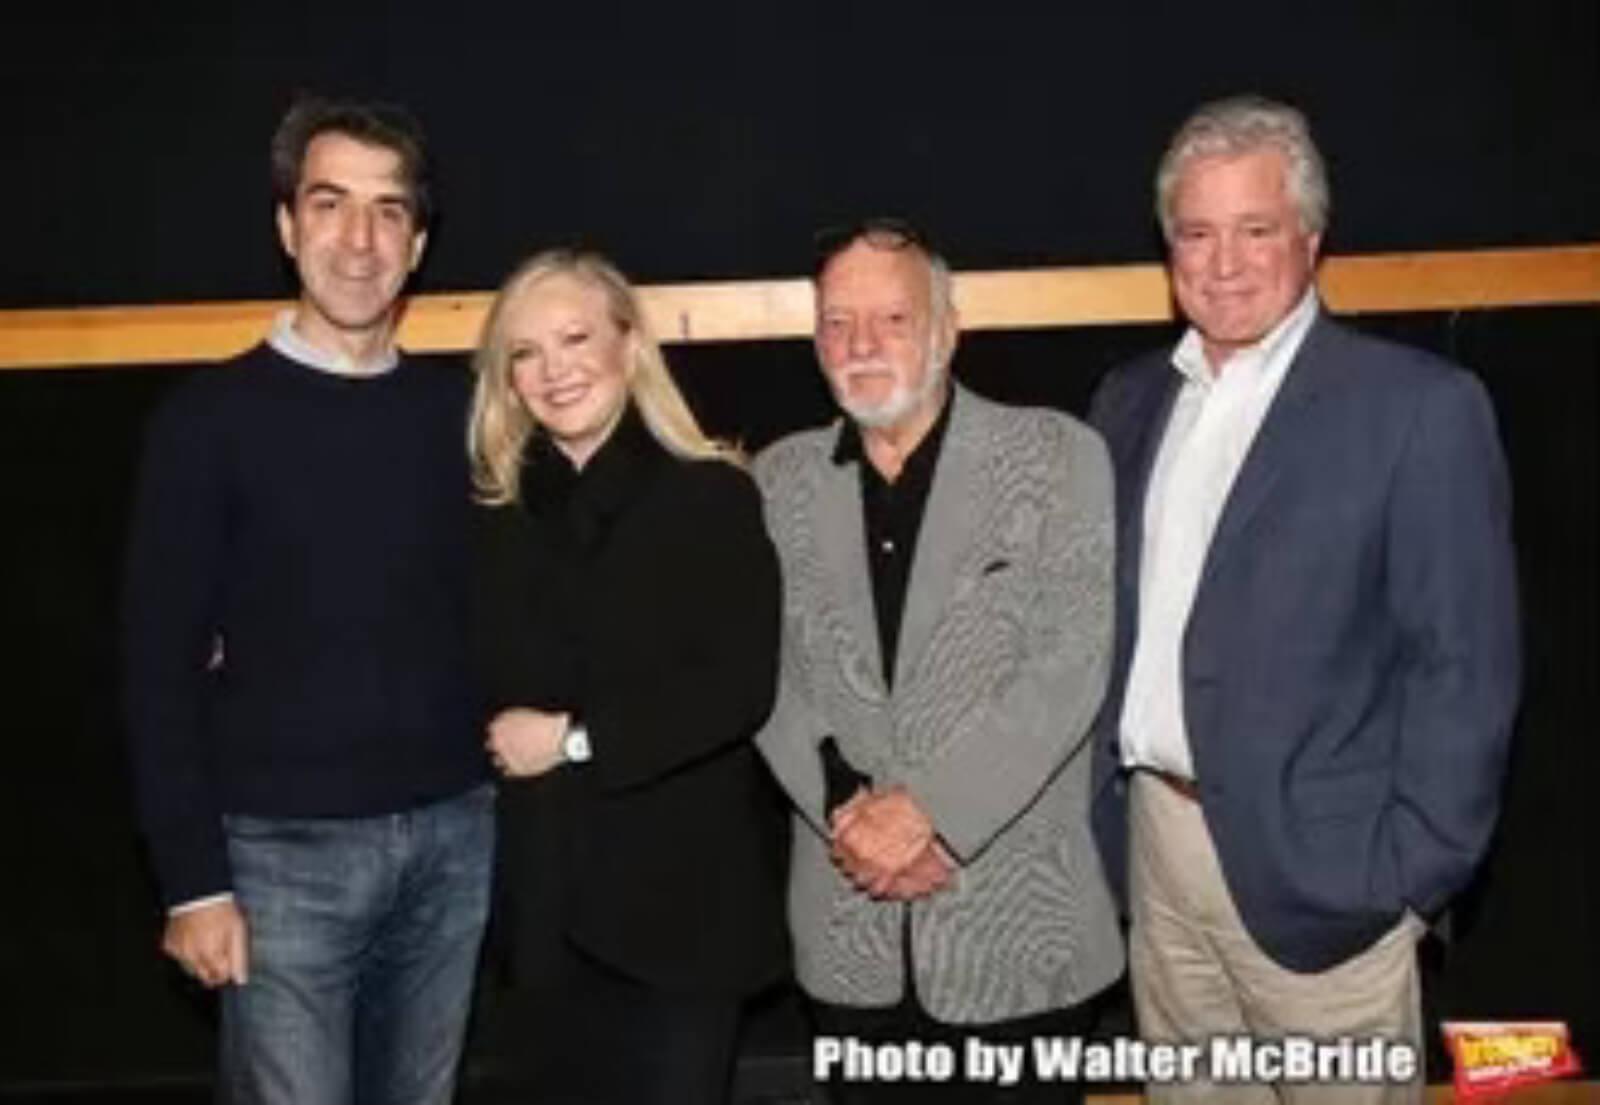 Jason Robert Brown, Susan Stroman, Hal Prince, and David Thompson working together on Prince of Broadway.